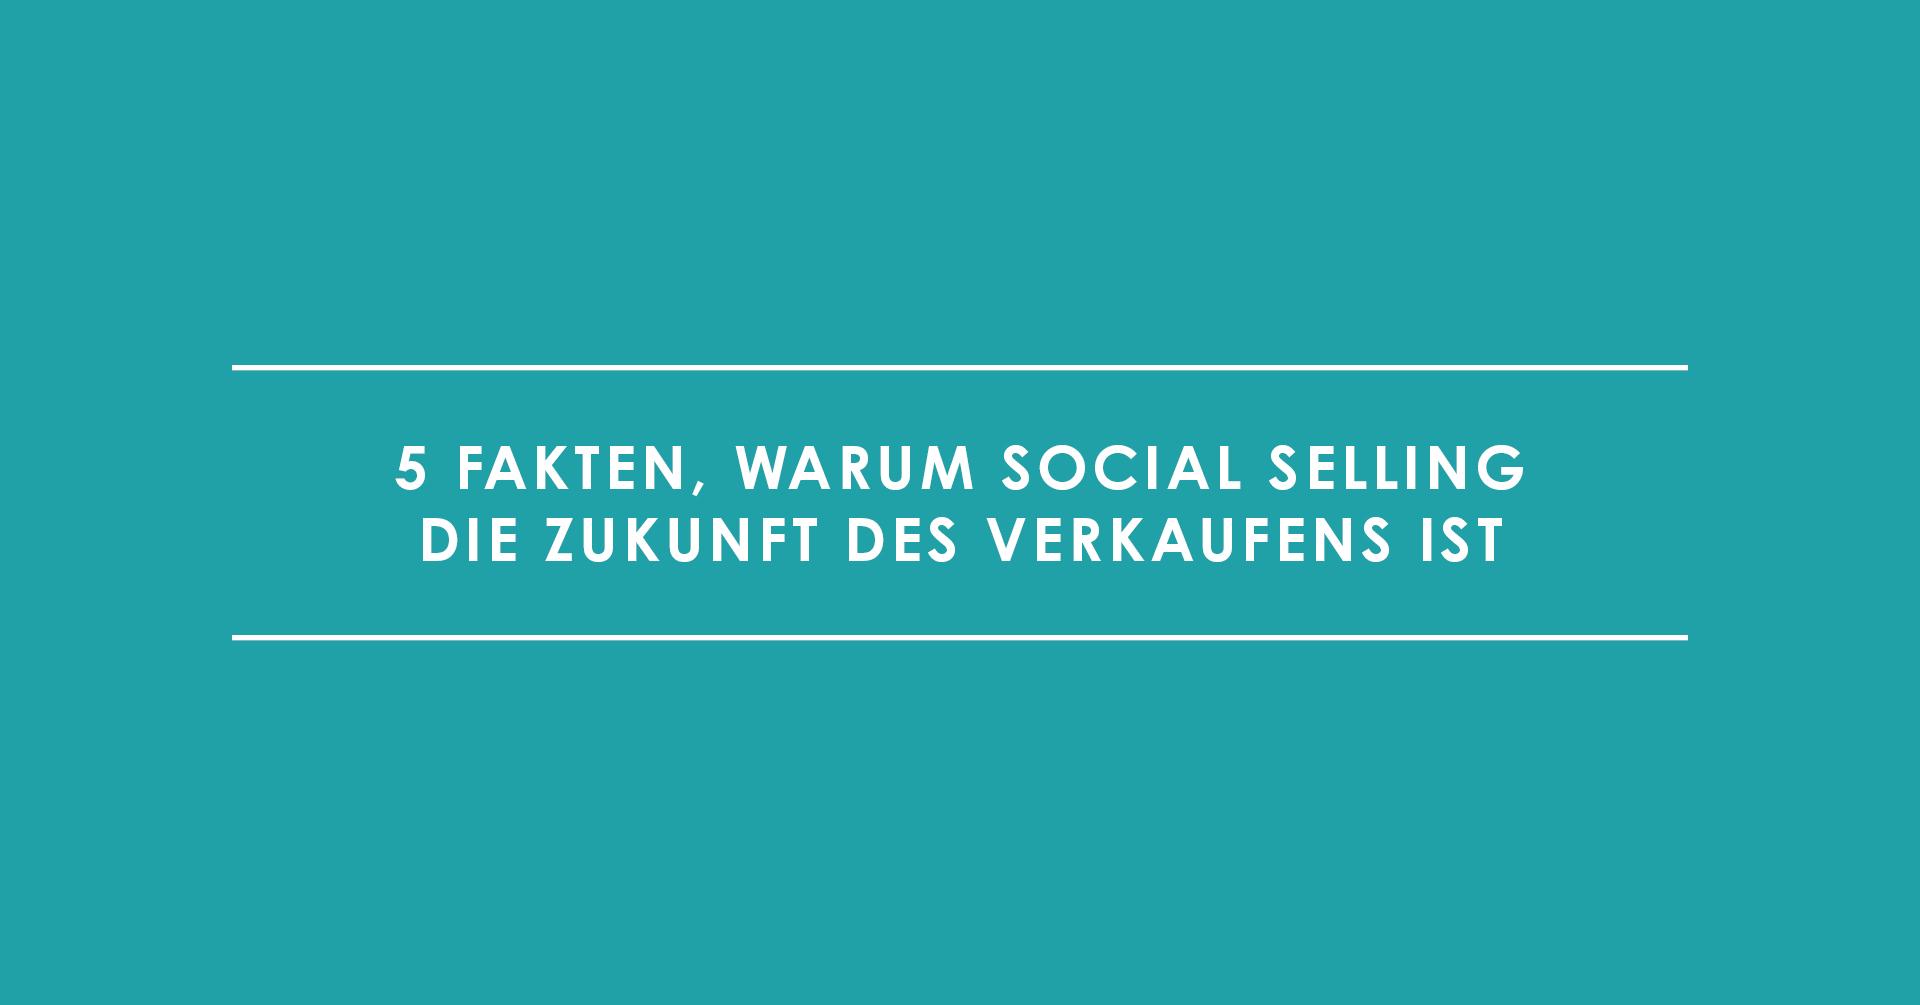 Social Selling ist die Zukunft des Verkaufens